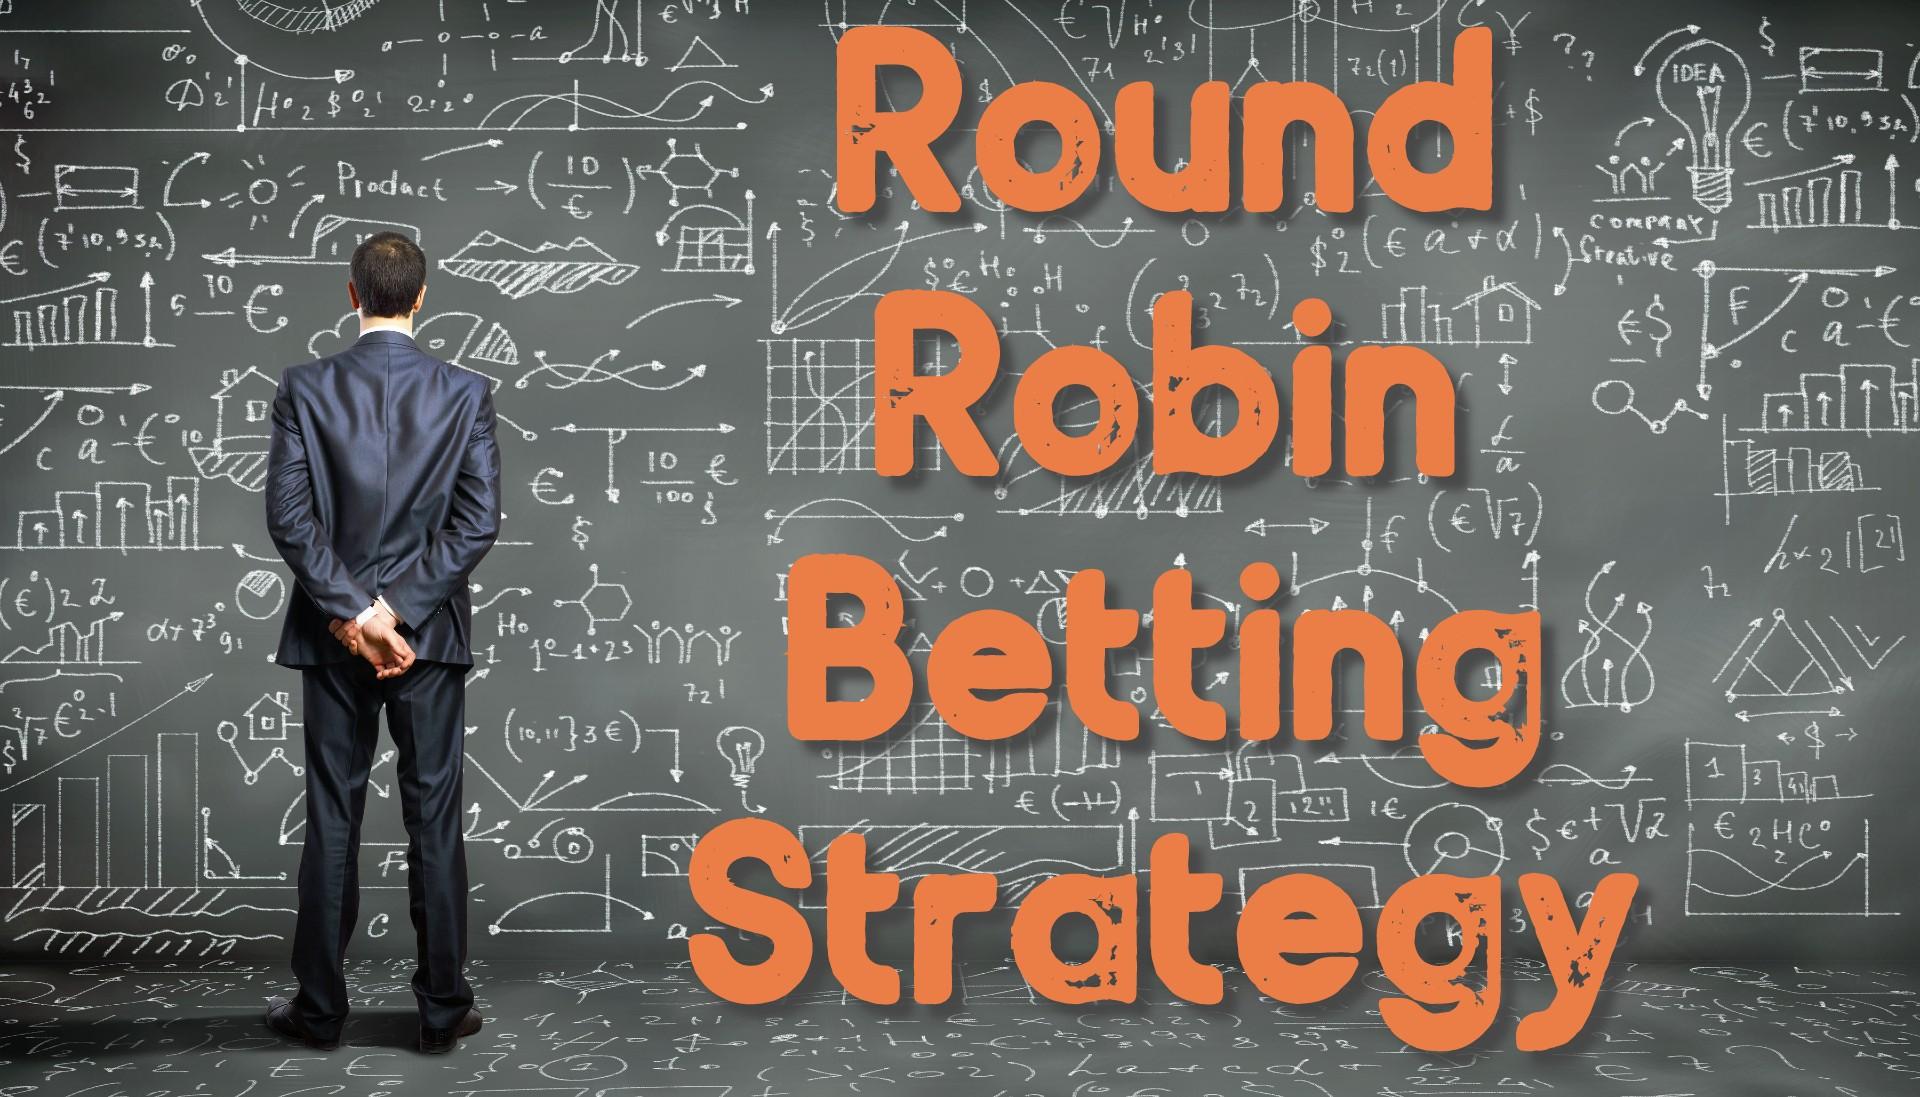 Round Robin Betting Strategy